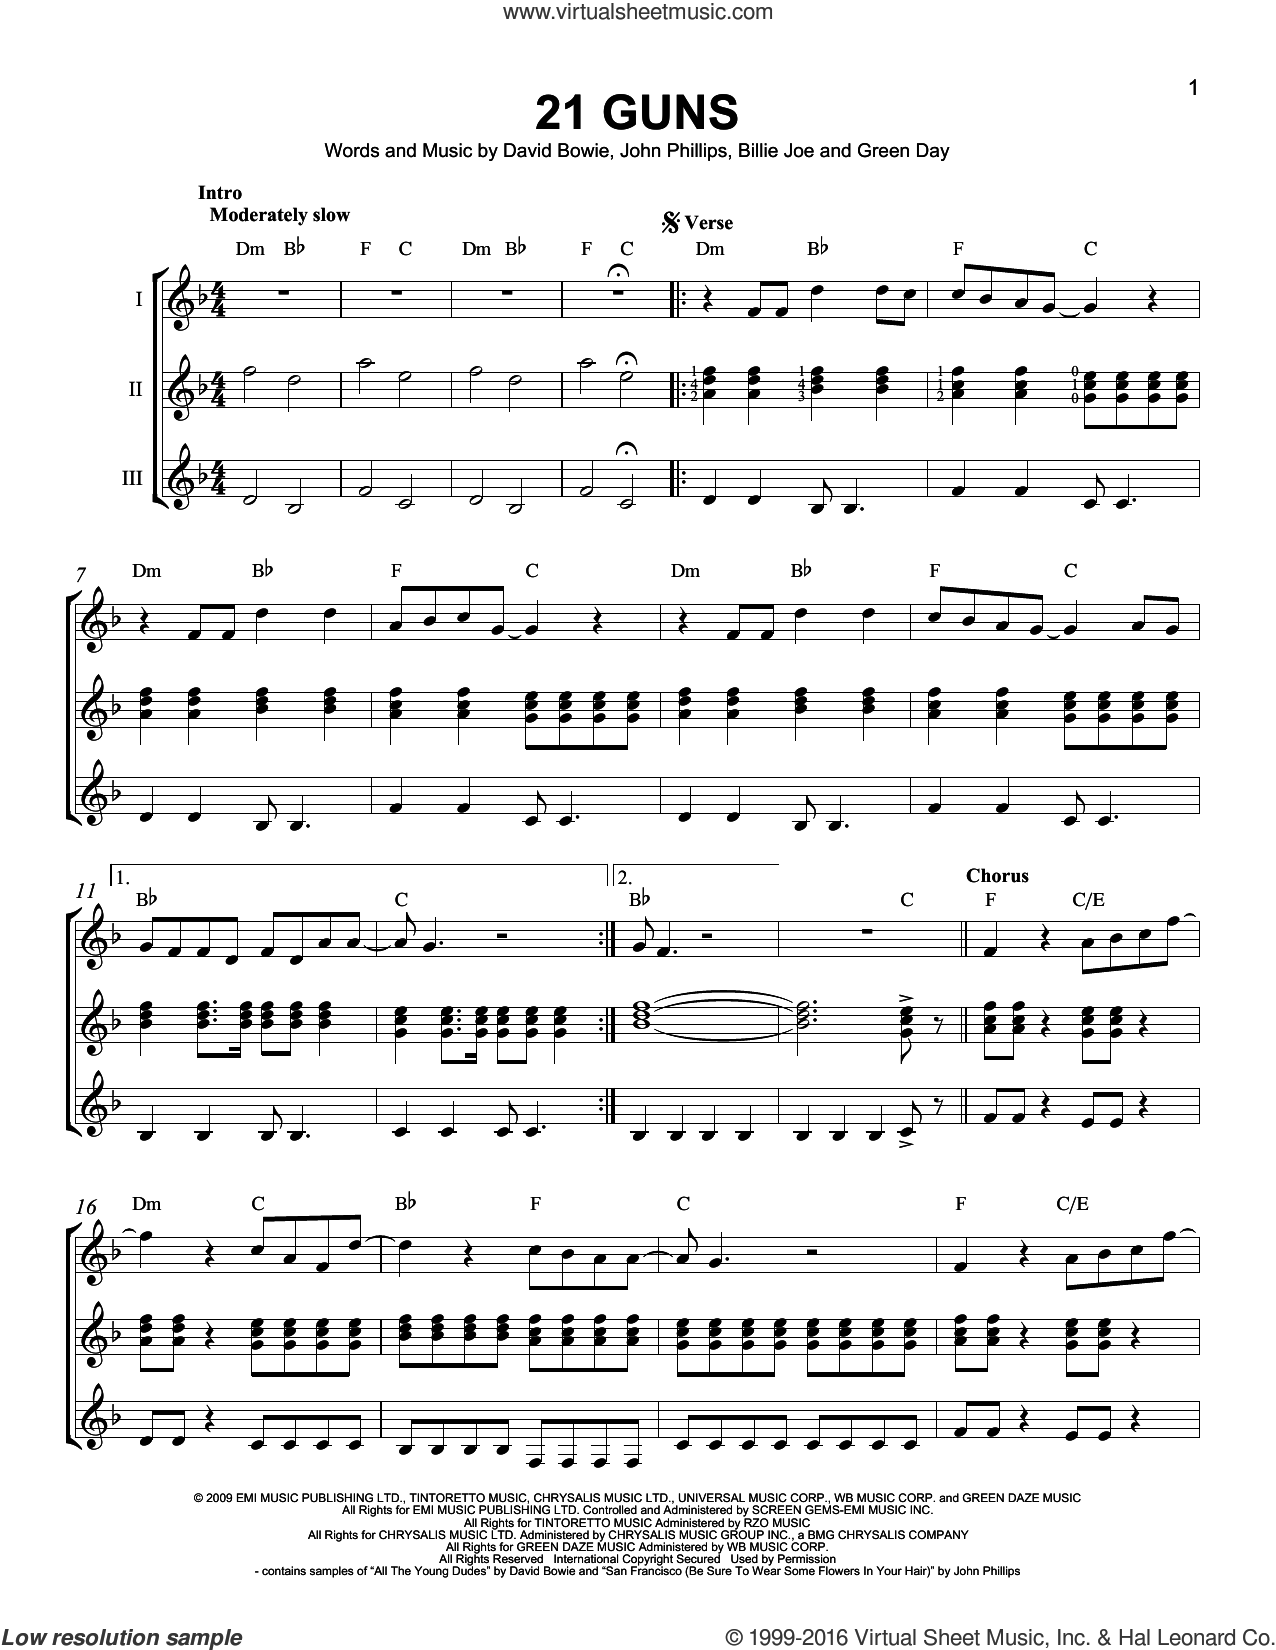 21 Guns sheet music for guitar ensemble by Green Day, Billie Joe, David Bowie and John Phillips, intermediate skill level